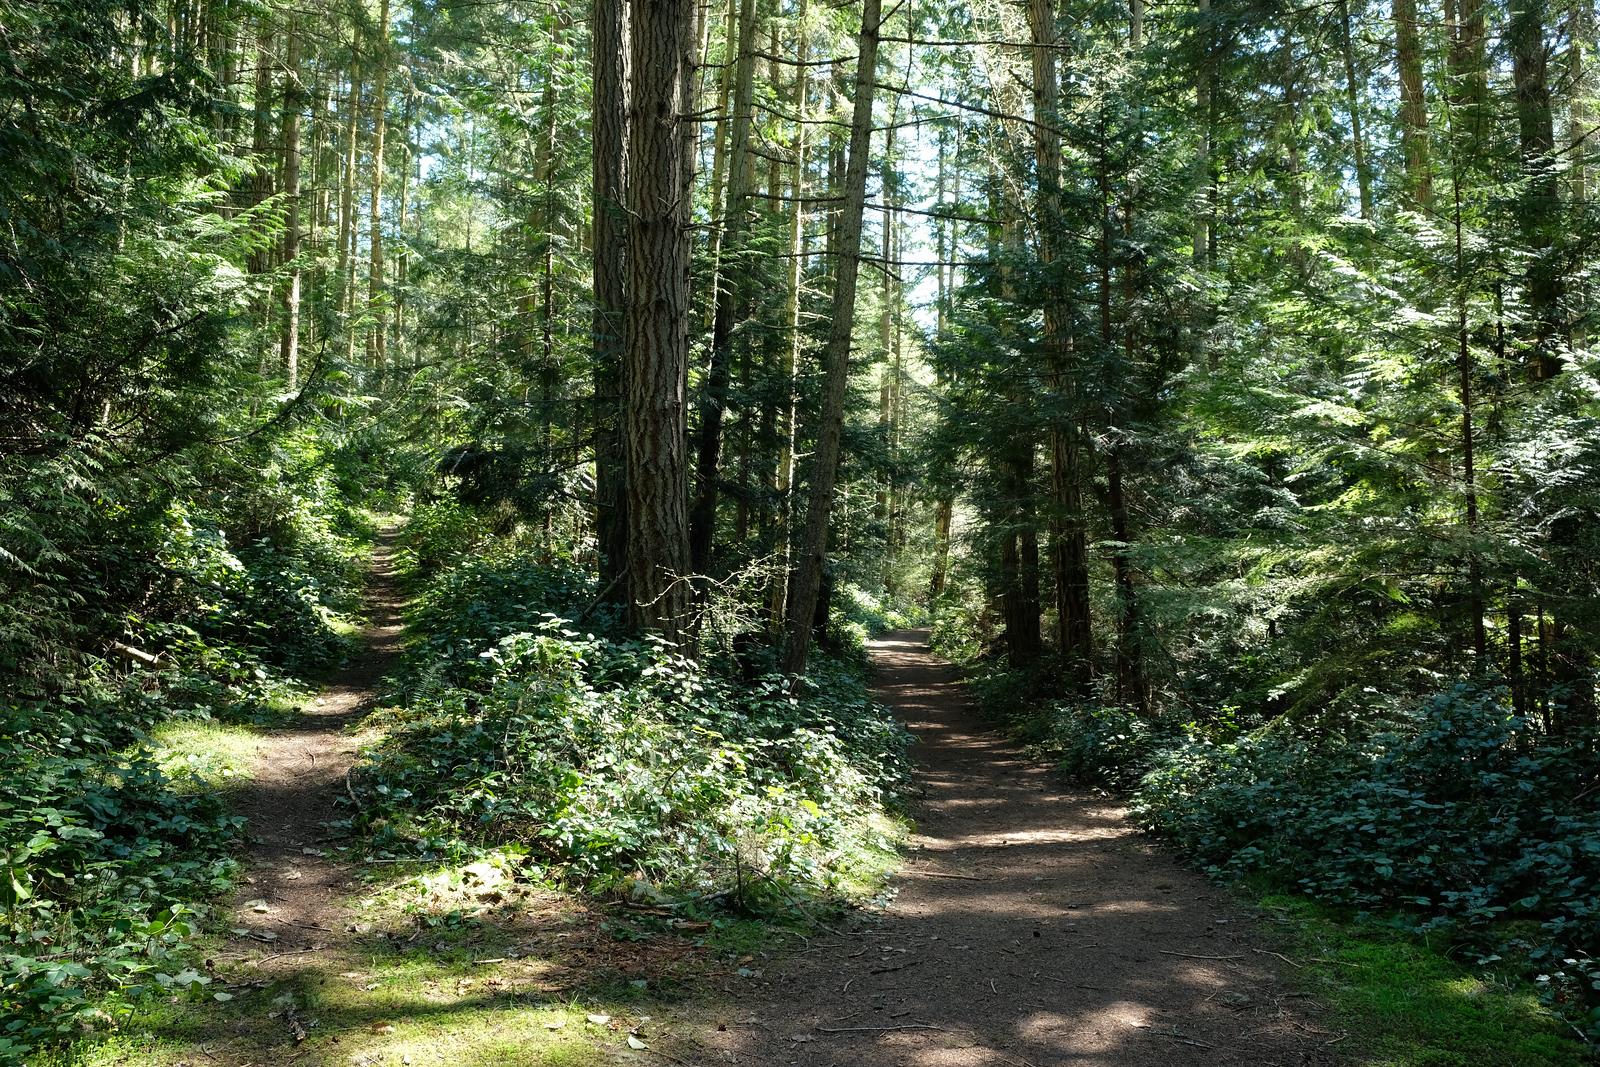 Single-track in Miller Peninsula State Park